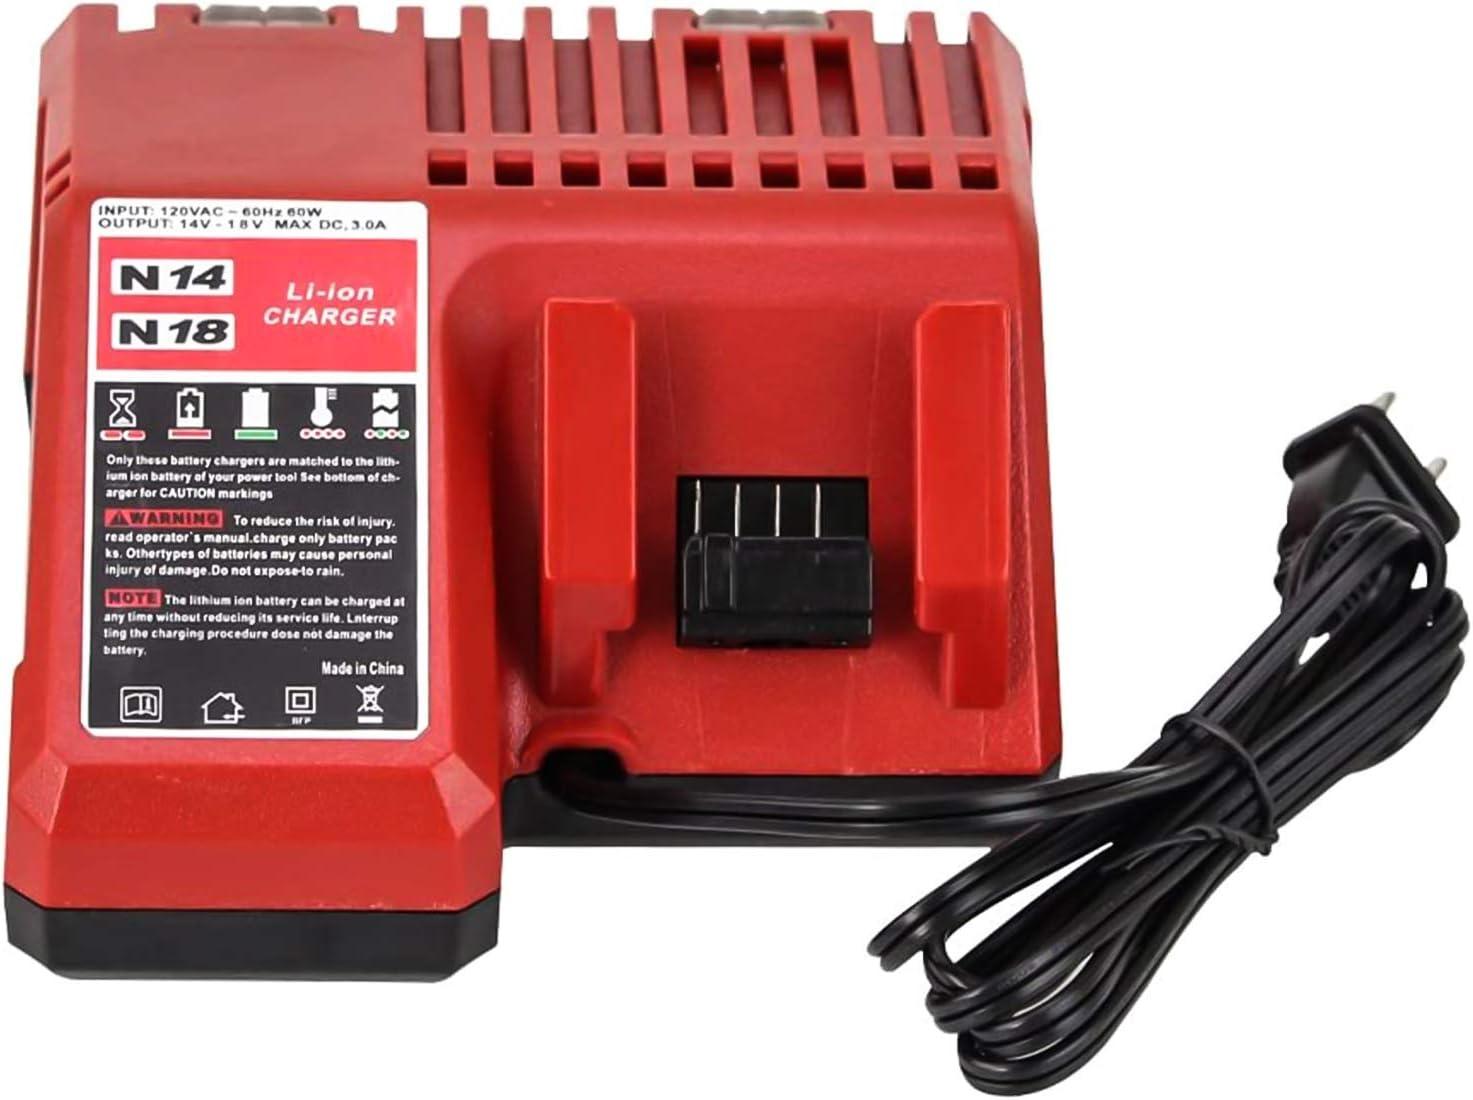 4-PORTS Milwaukee M18//M14 14V//18V Li-Ion Battery Replace Fast Charger-4 PORT*3Ah